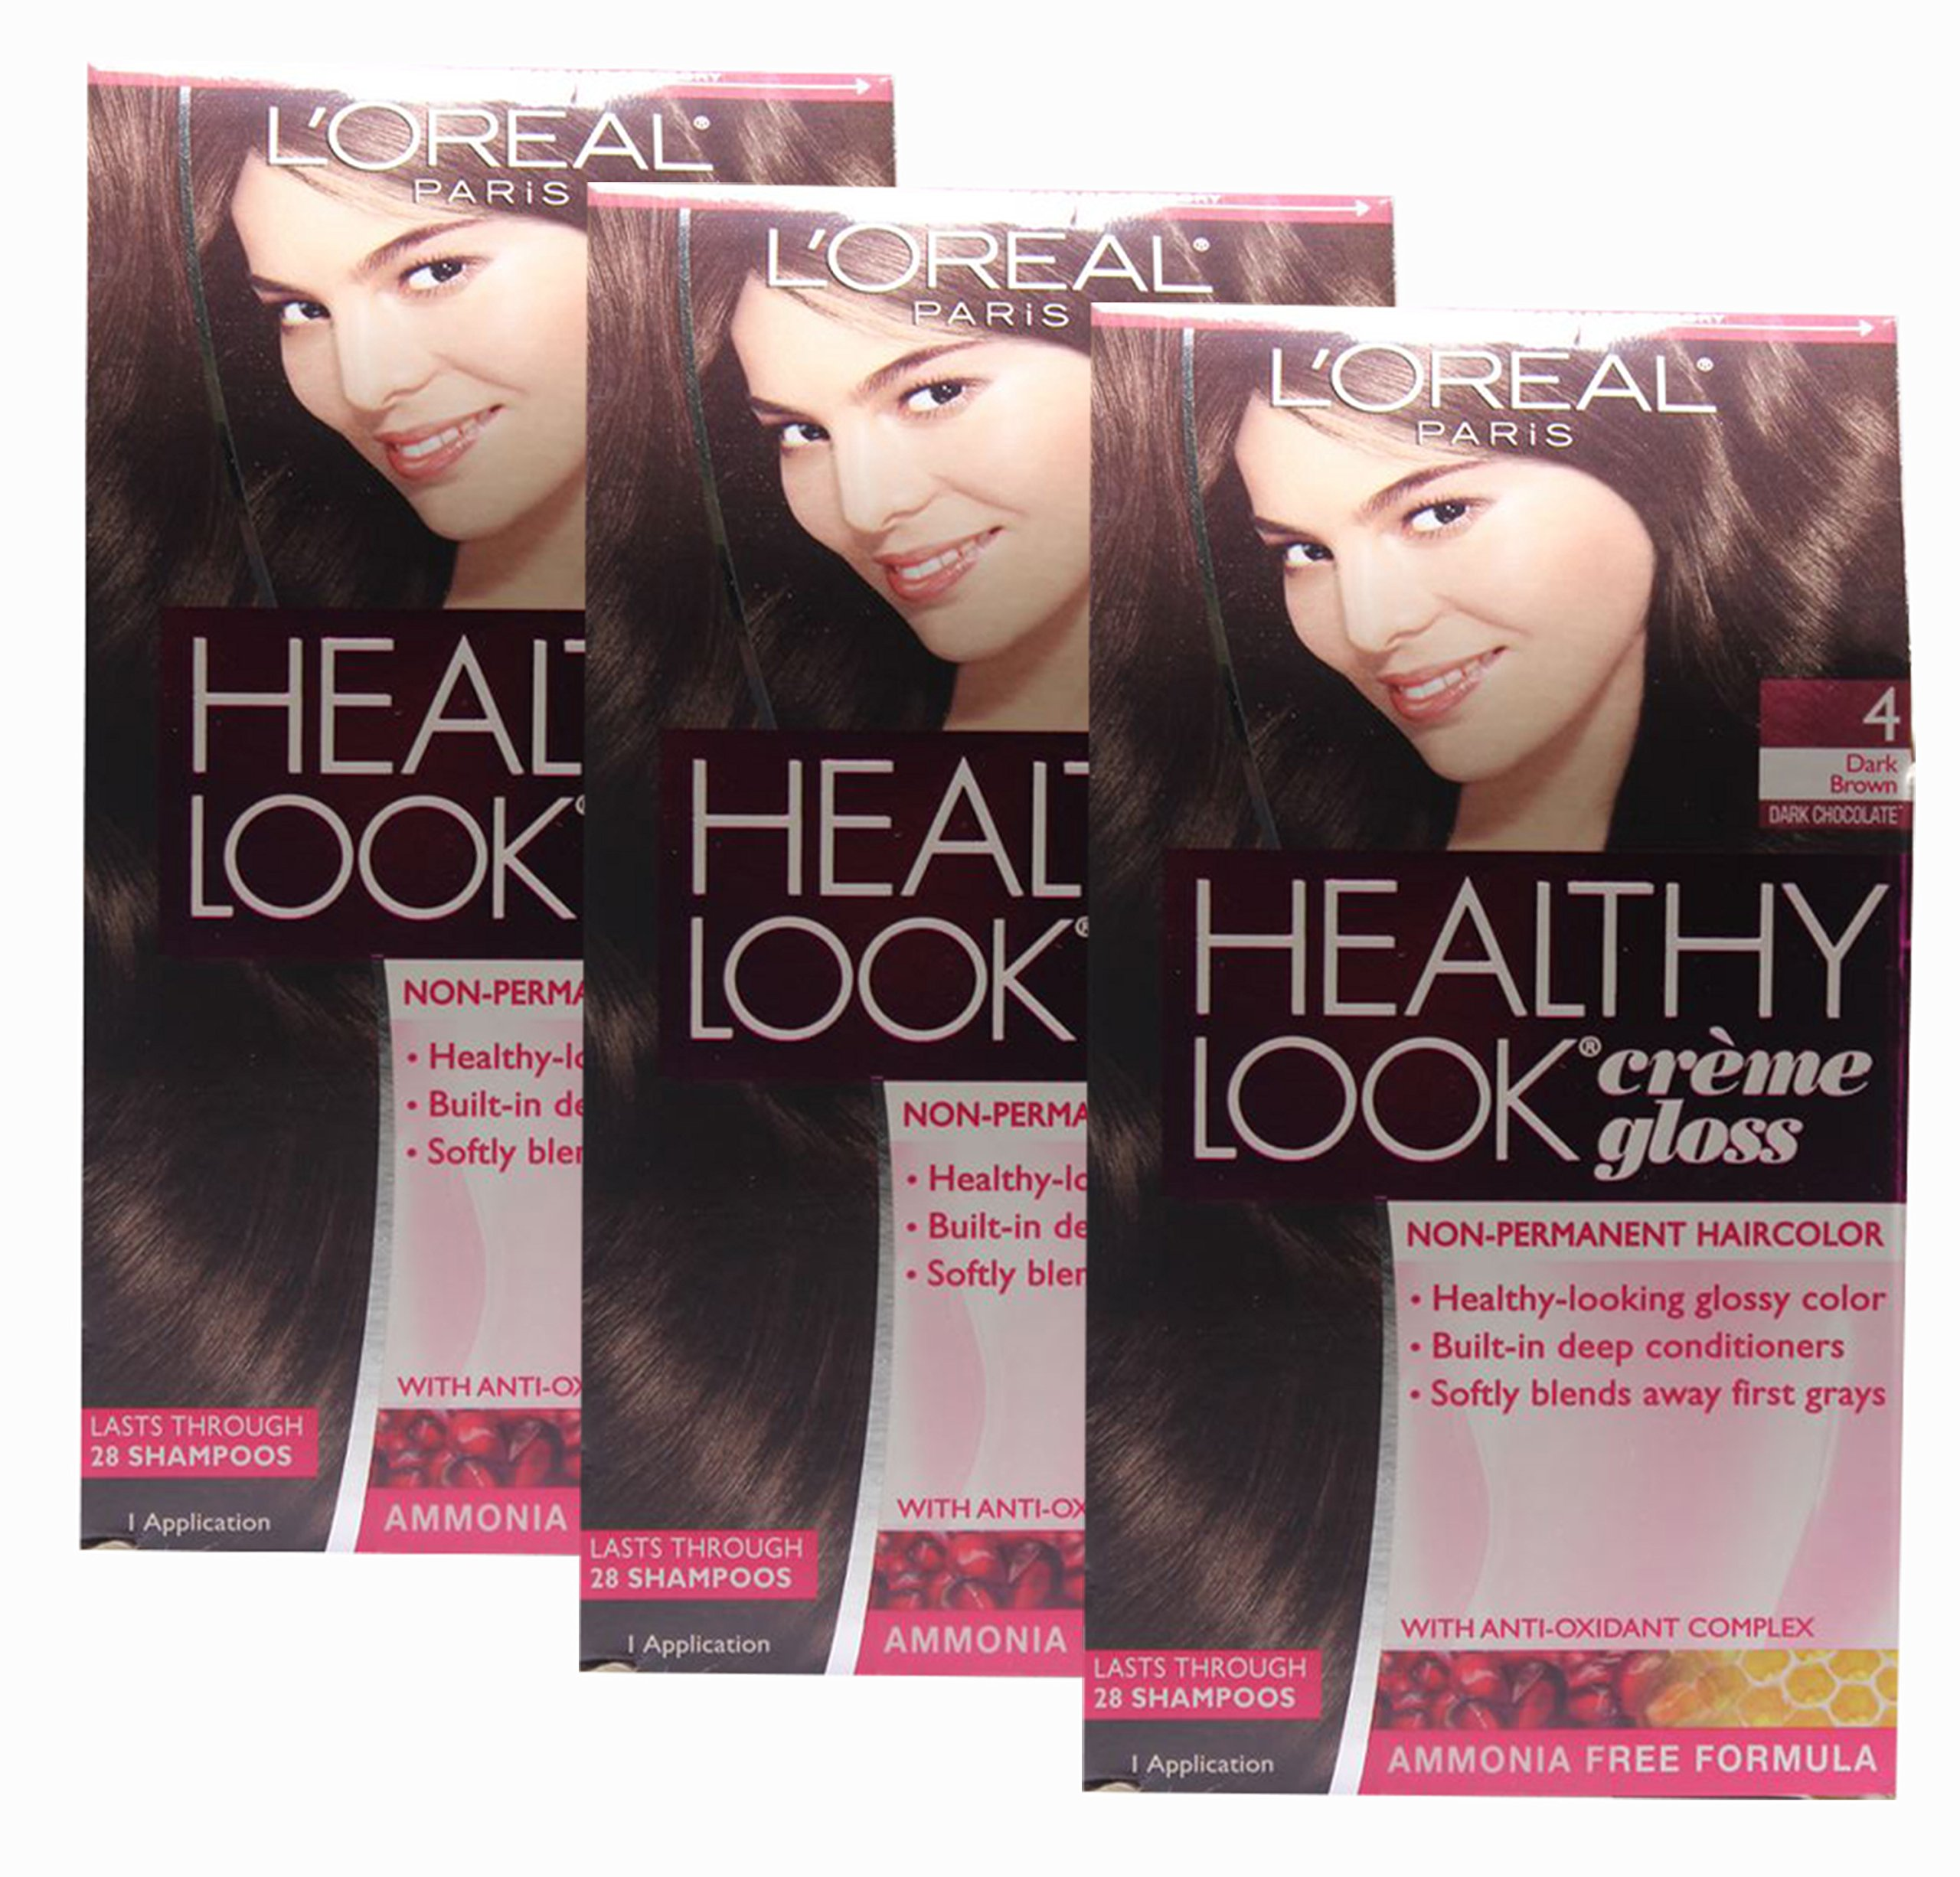 Loreal Healthy Look Hair Dye, Creme Gloss Color, Dark Brown 4, 1 ct (Pack of 3) by L'Oreal Paris